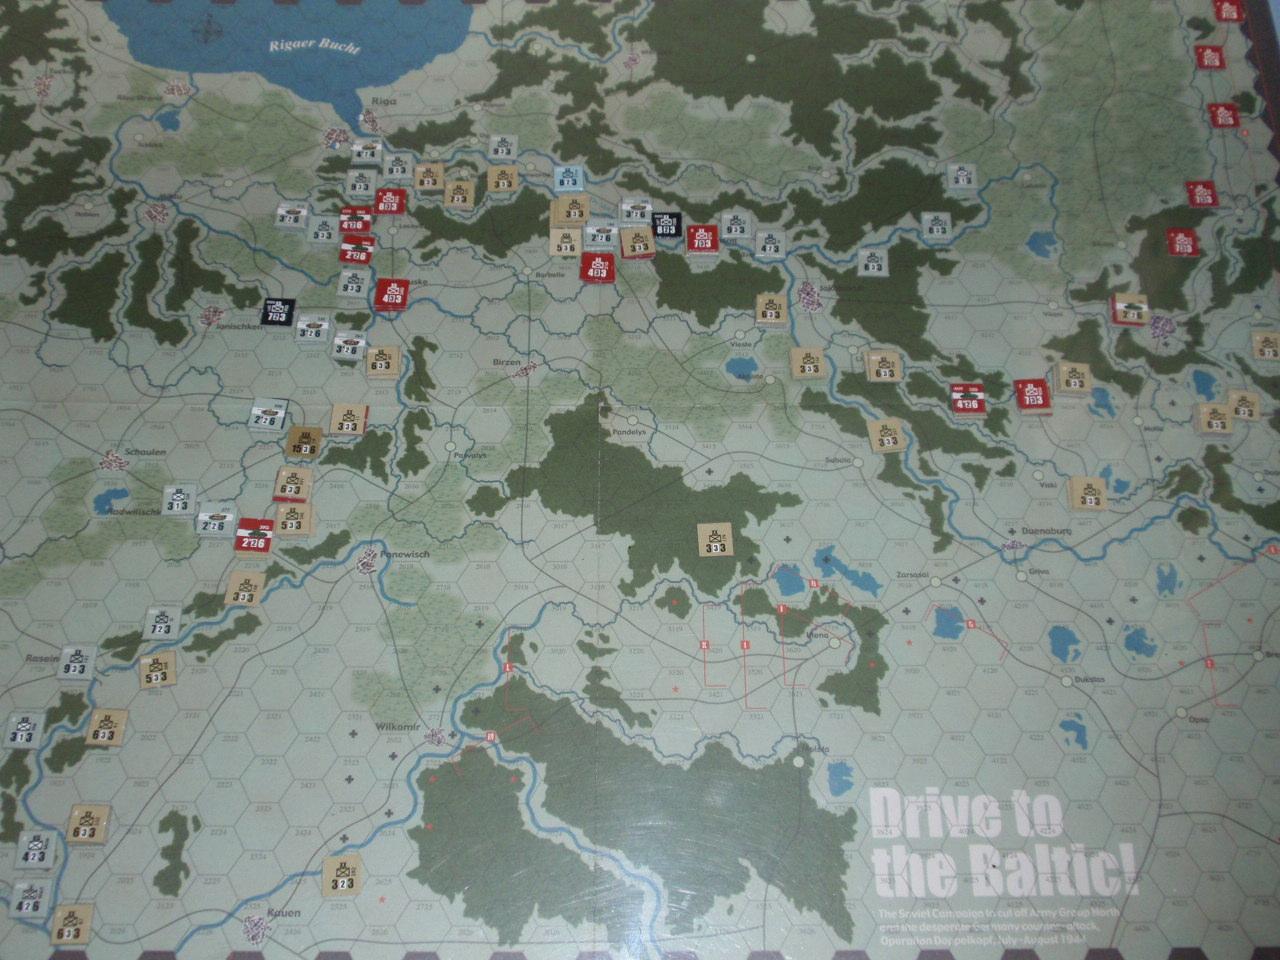 MIH/CMJ「Drive to the Baltic!」をソロプレイ②_b0162202_19271312.jpg